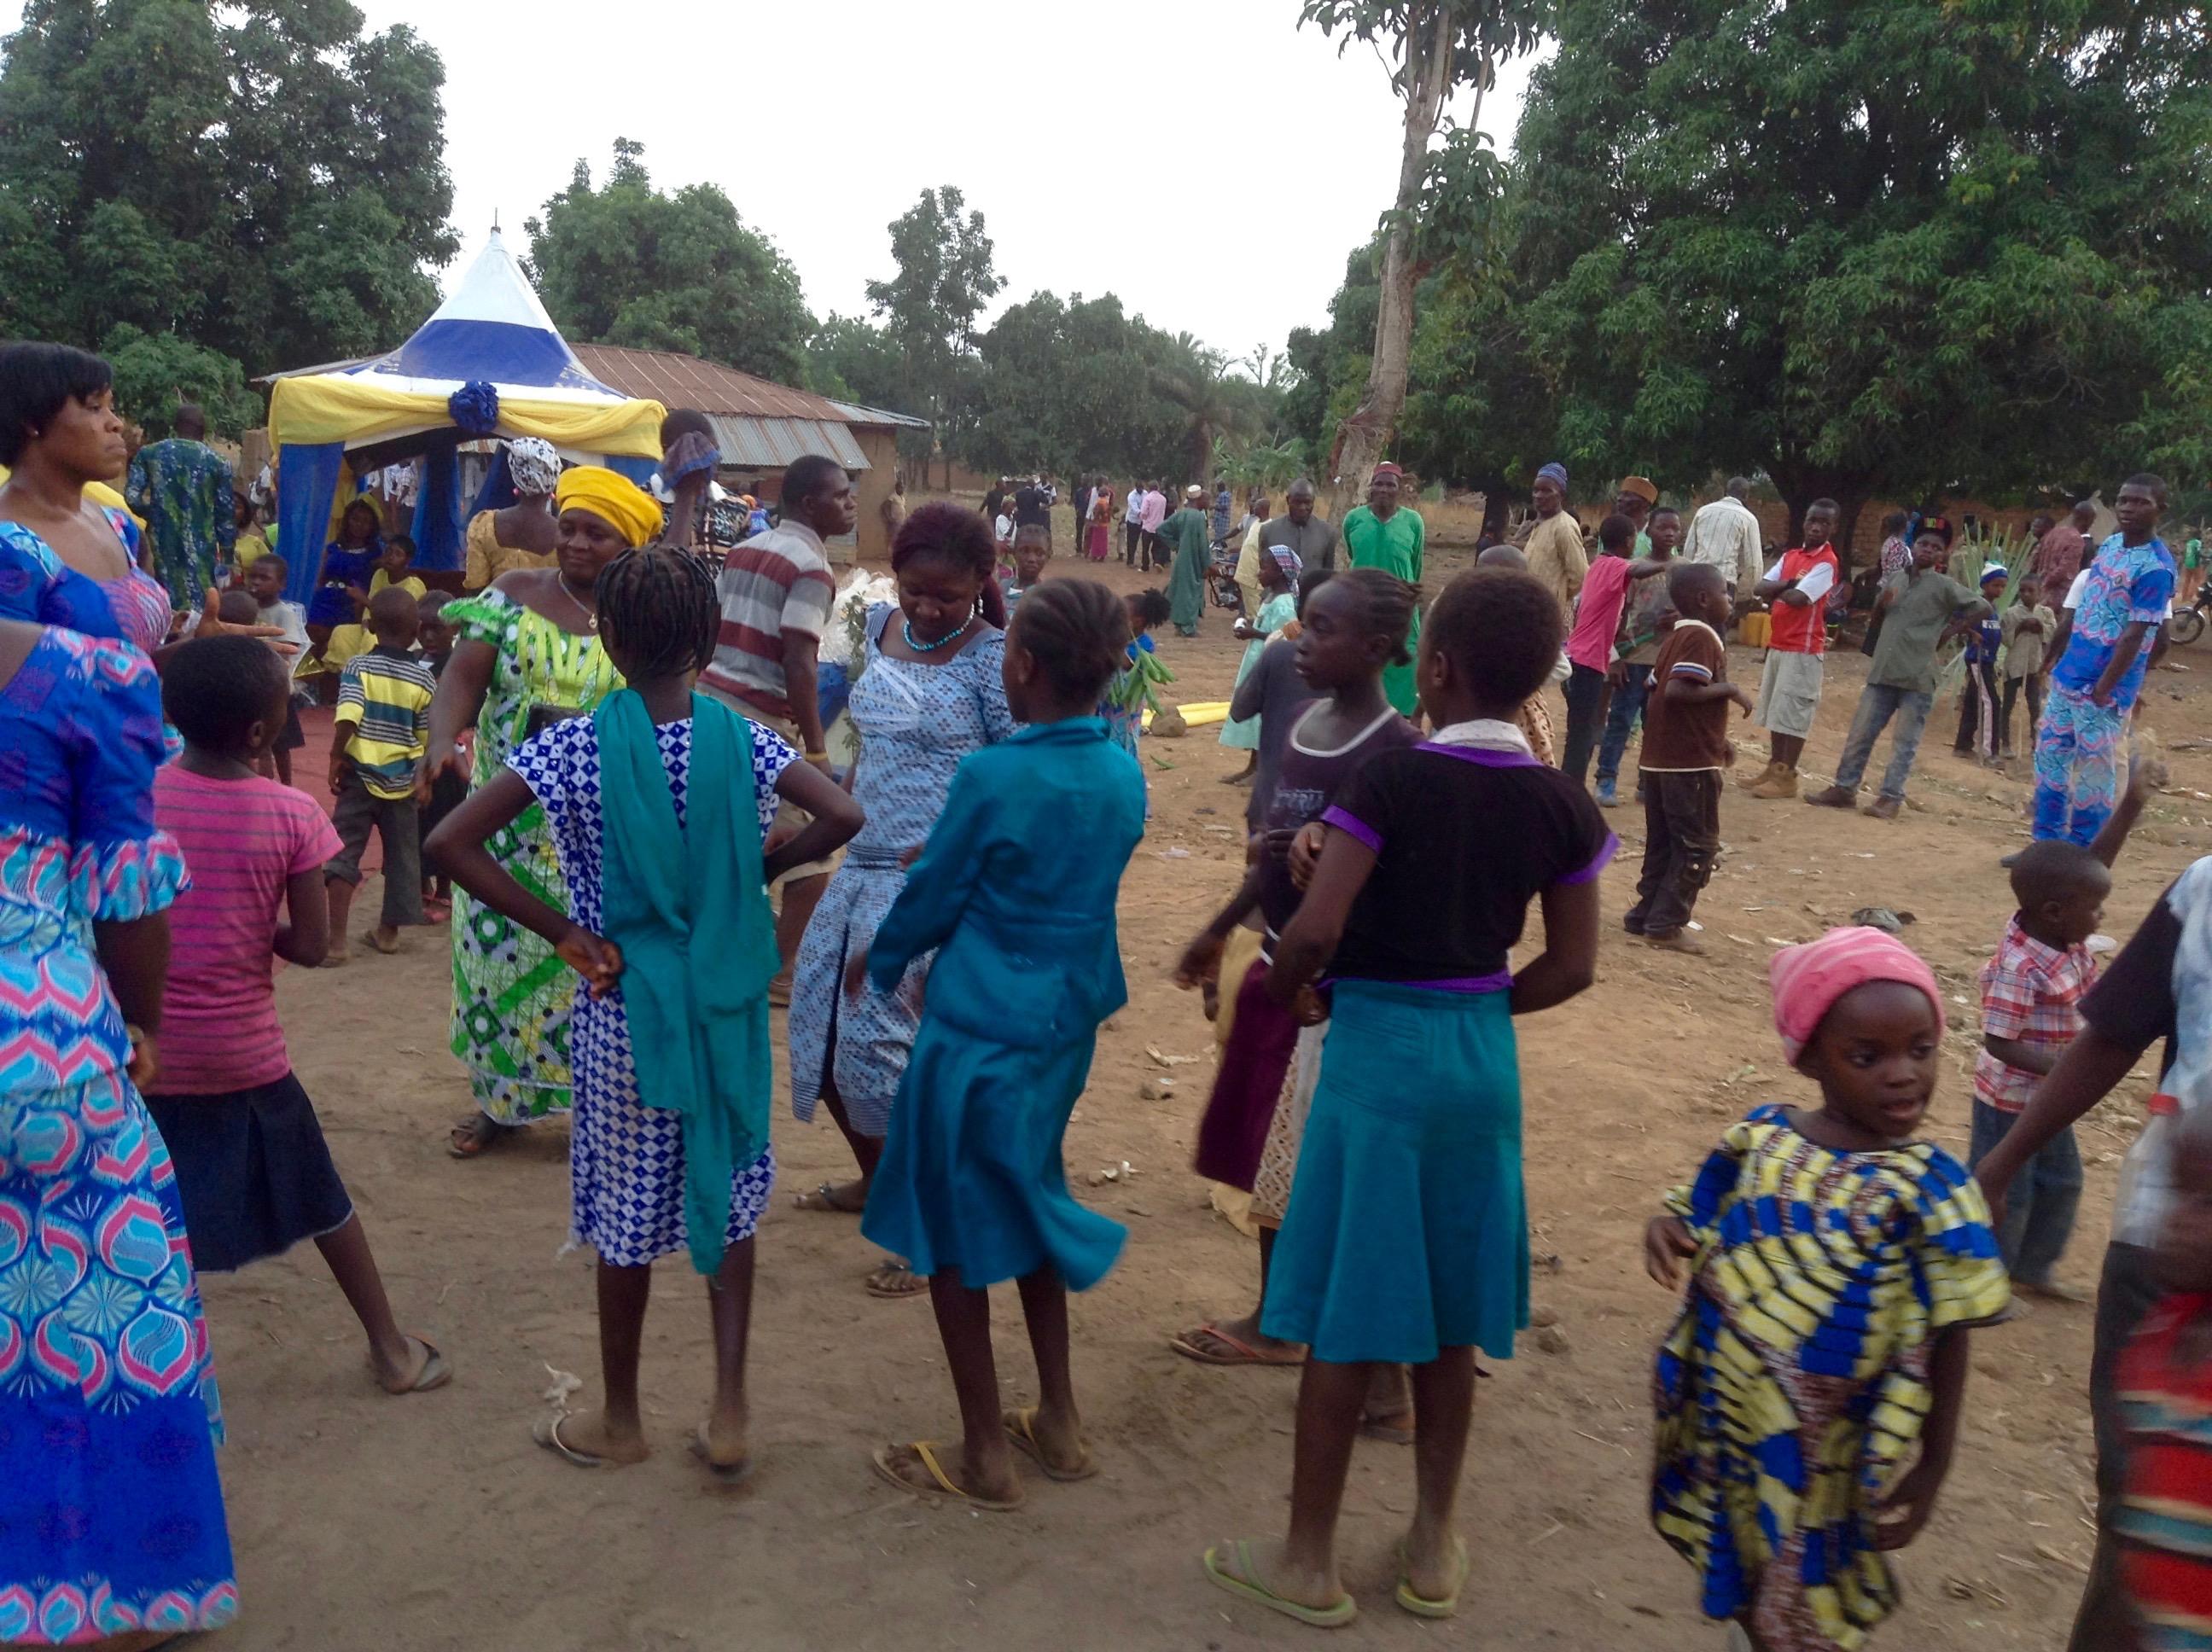 Celebrating in Fadan Karshe, Kaduna, Nigeria. #JujuFilms